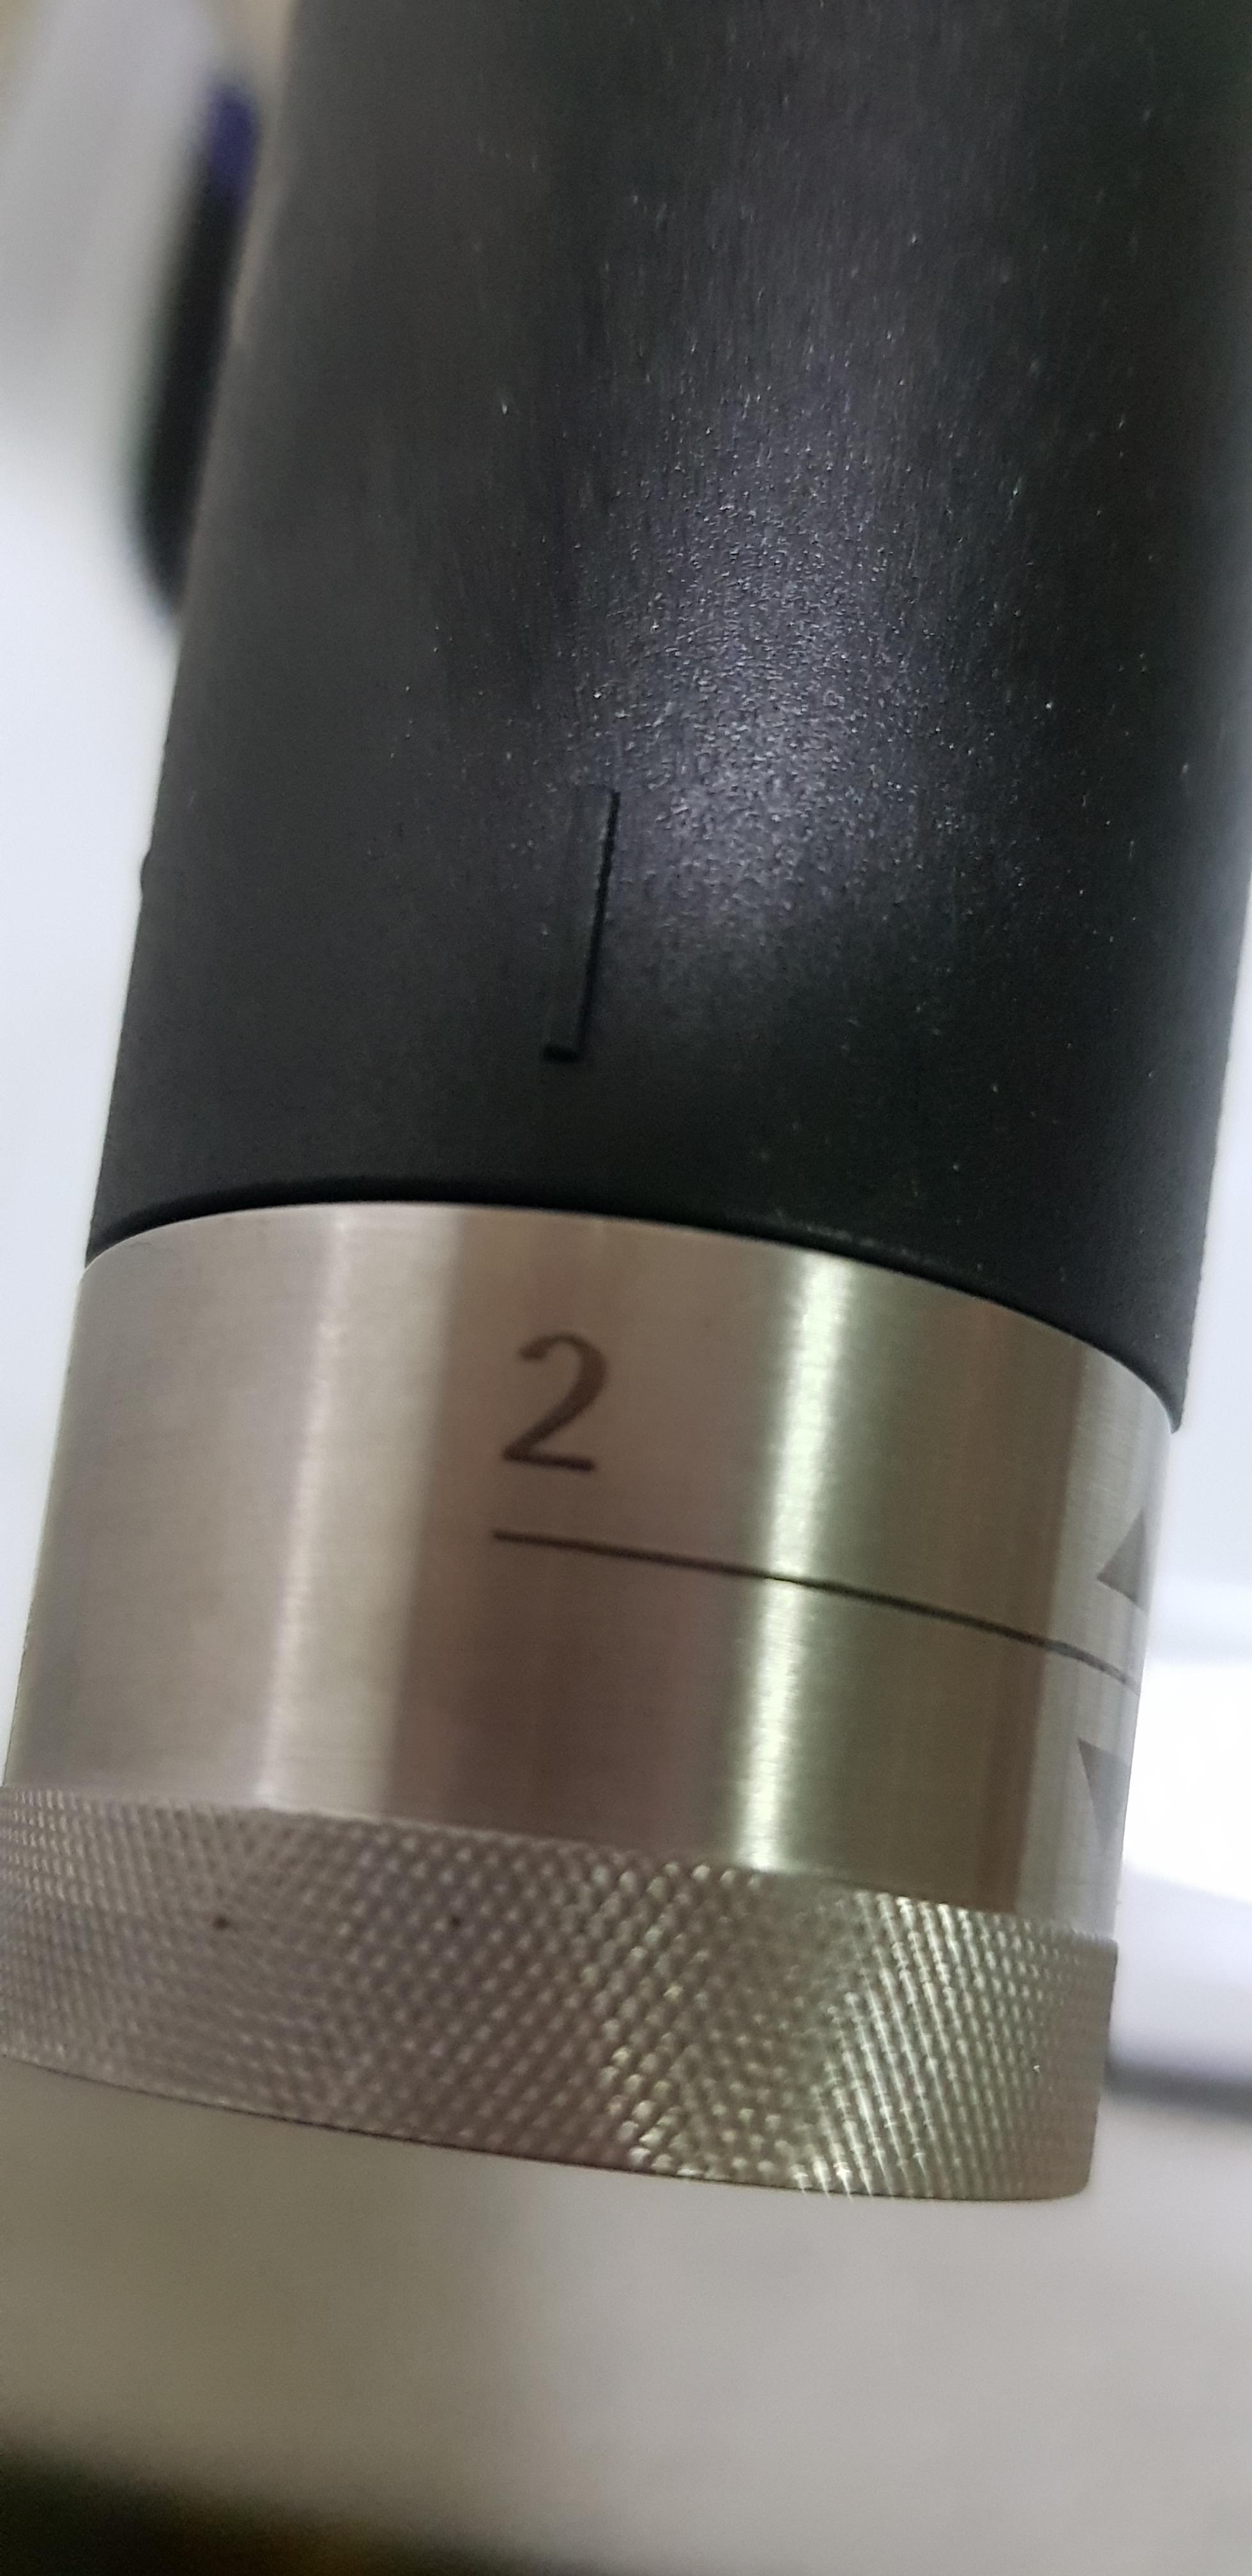 WMF快力鍋體驗~原來使用壓力鍋這樣簡單的第 7 張圖片